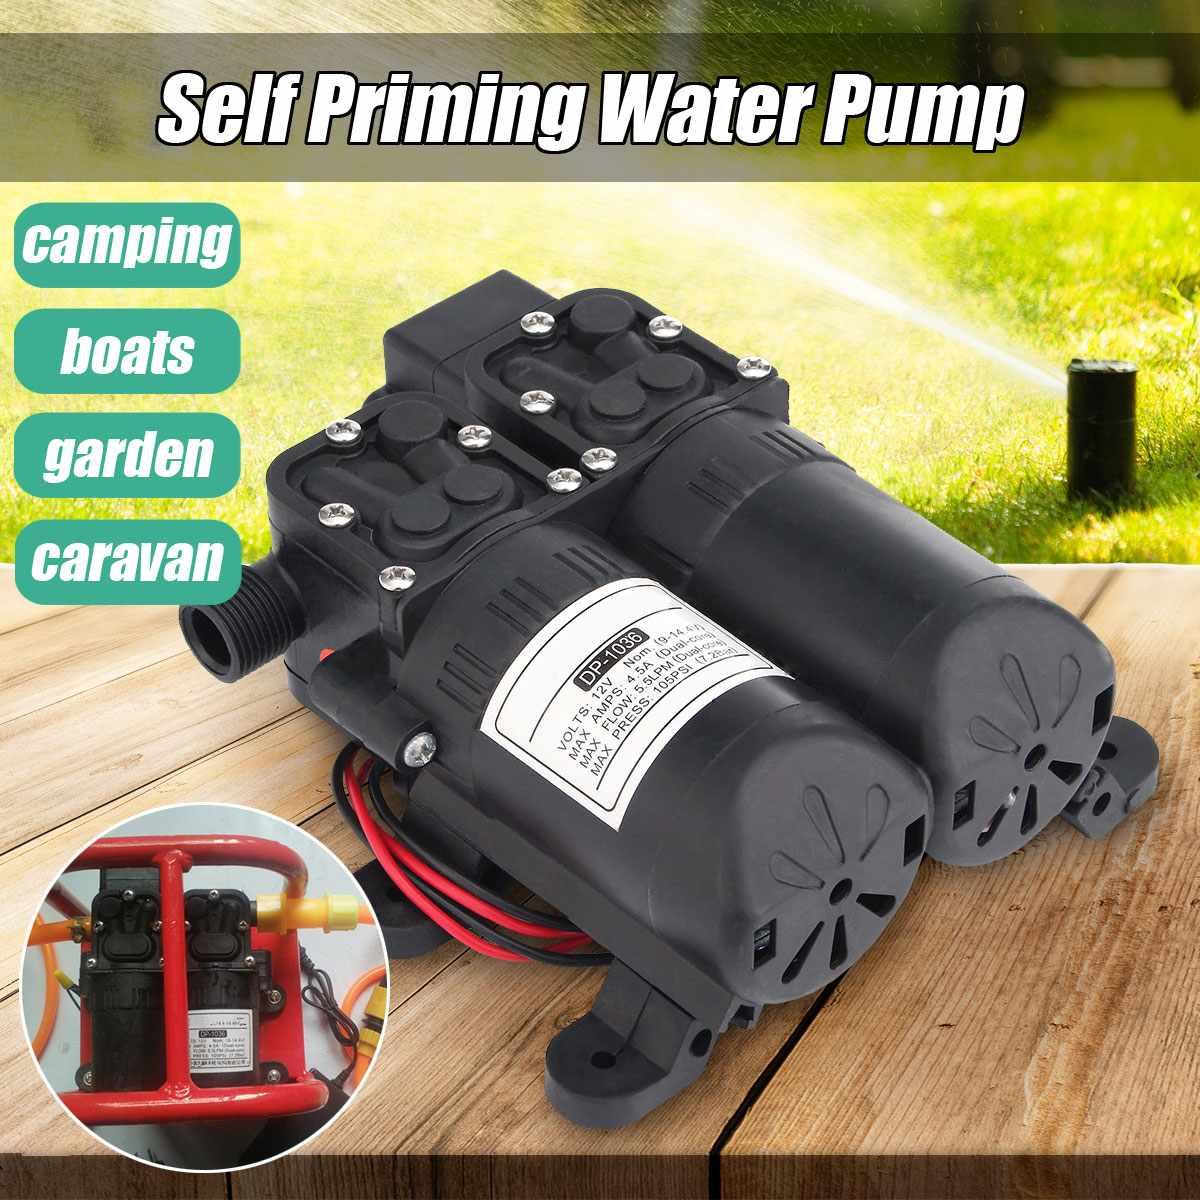 Updated DC 12V 105PSI Water High Pressure Diaphragm Water Pump Self Priming Dual Pressure Sprinkler Pump Automatic Switch